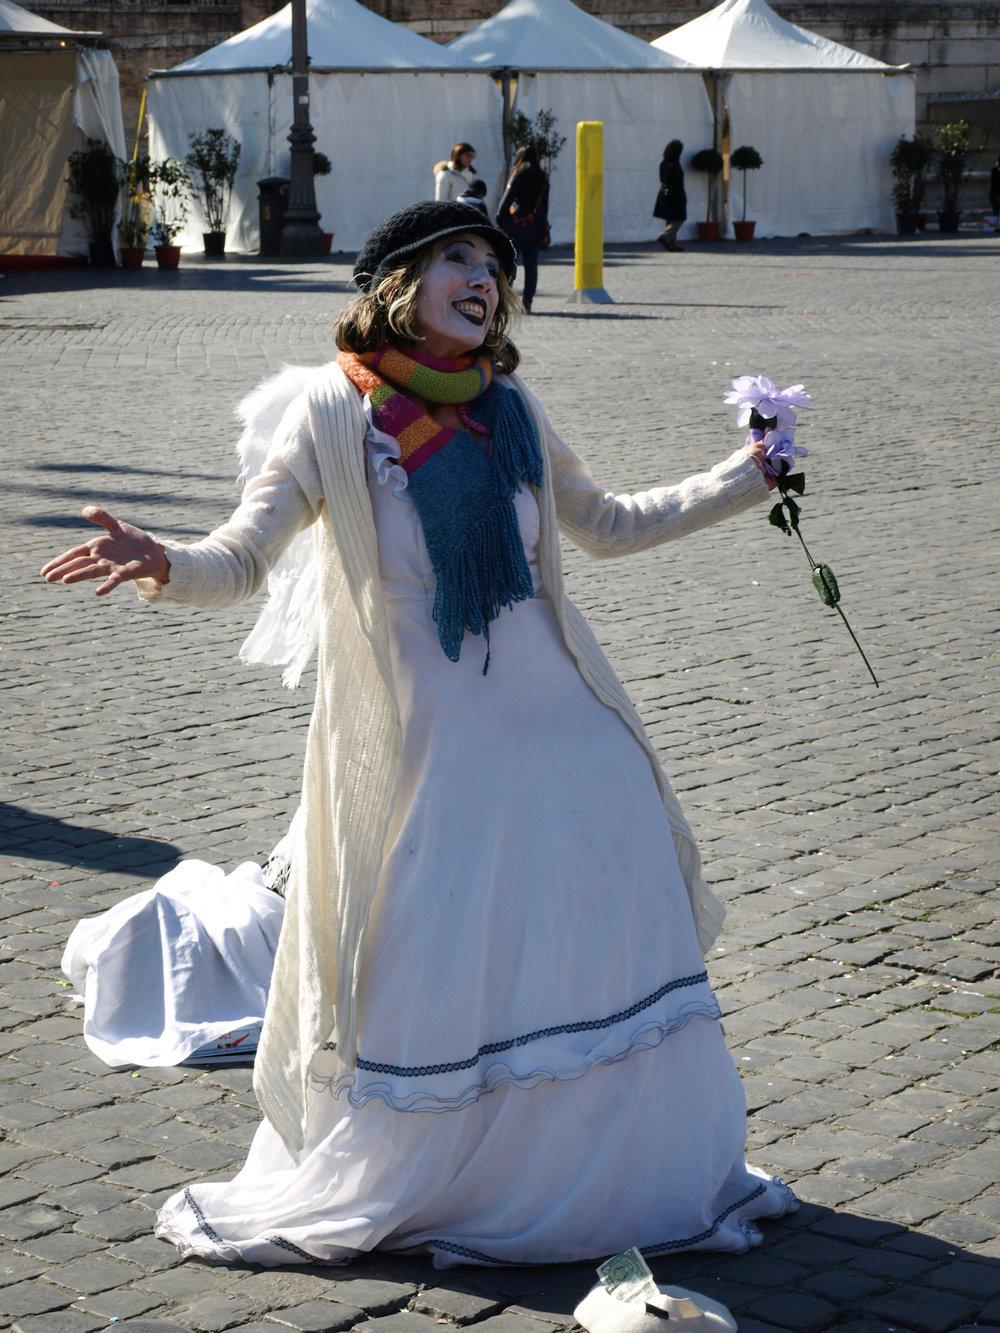 Piazza del Popolo, Italy  / Geena Matuson @geenamatuson #thegirlmirage